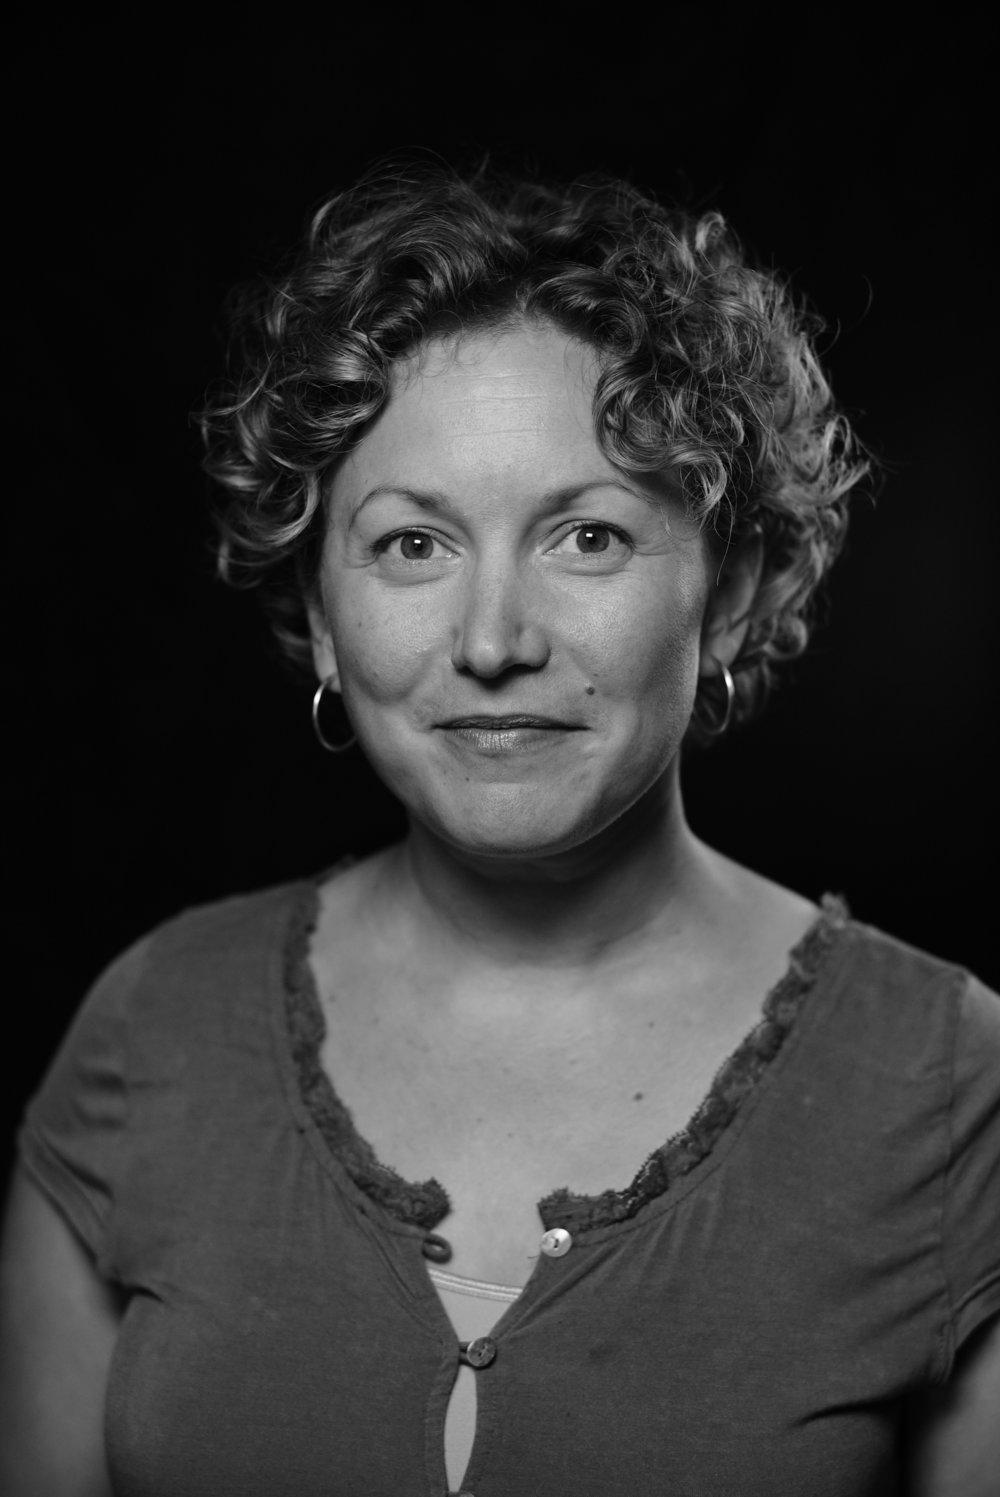 <p>DANIELLE BRYAN</p><p>DANIELLE@FUELDFILMS.COM</p>